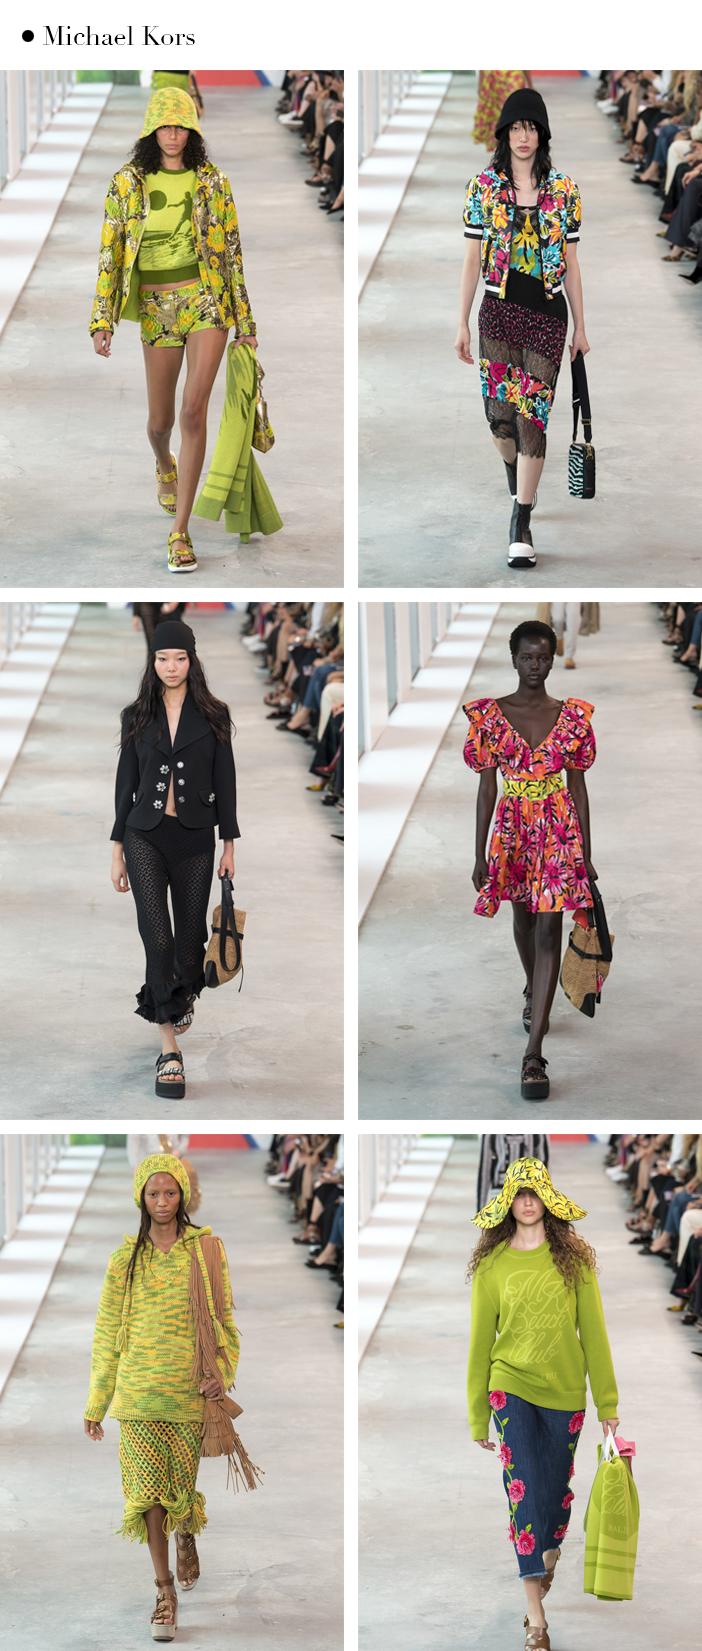 New York fashion week verão 2019 Michael Kors